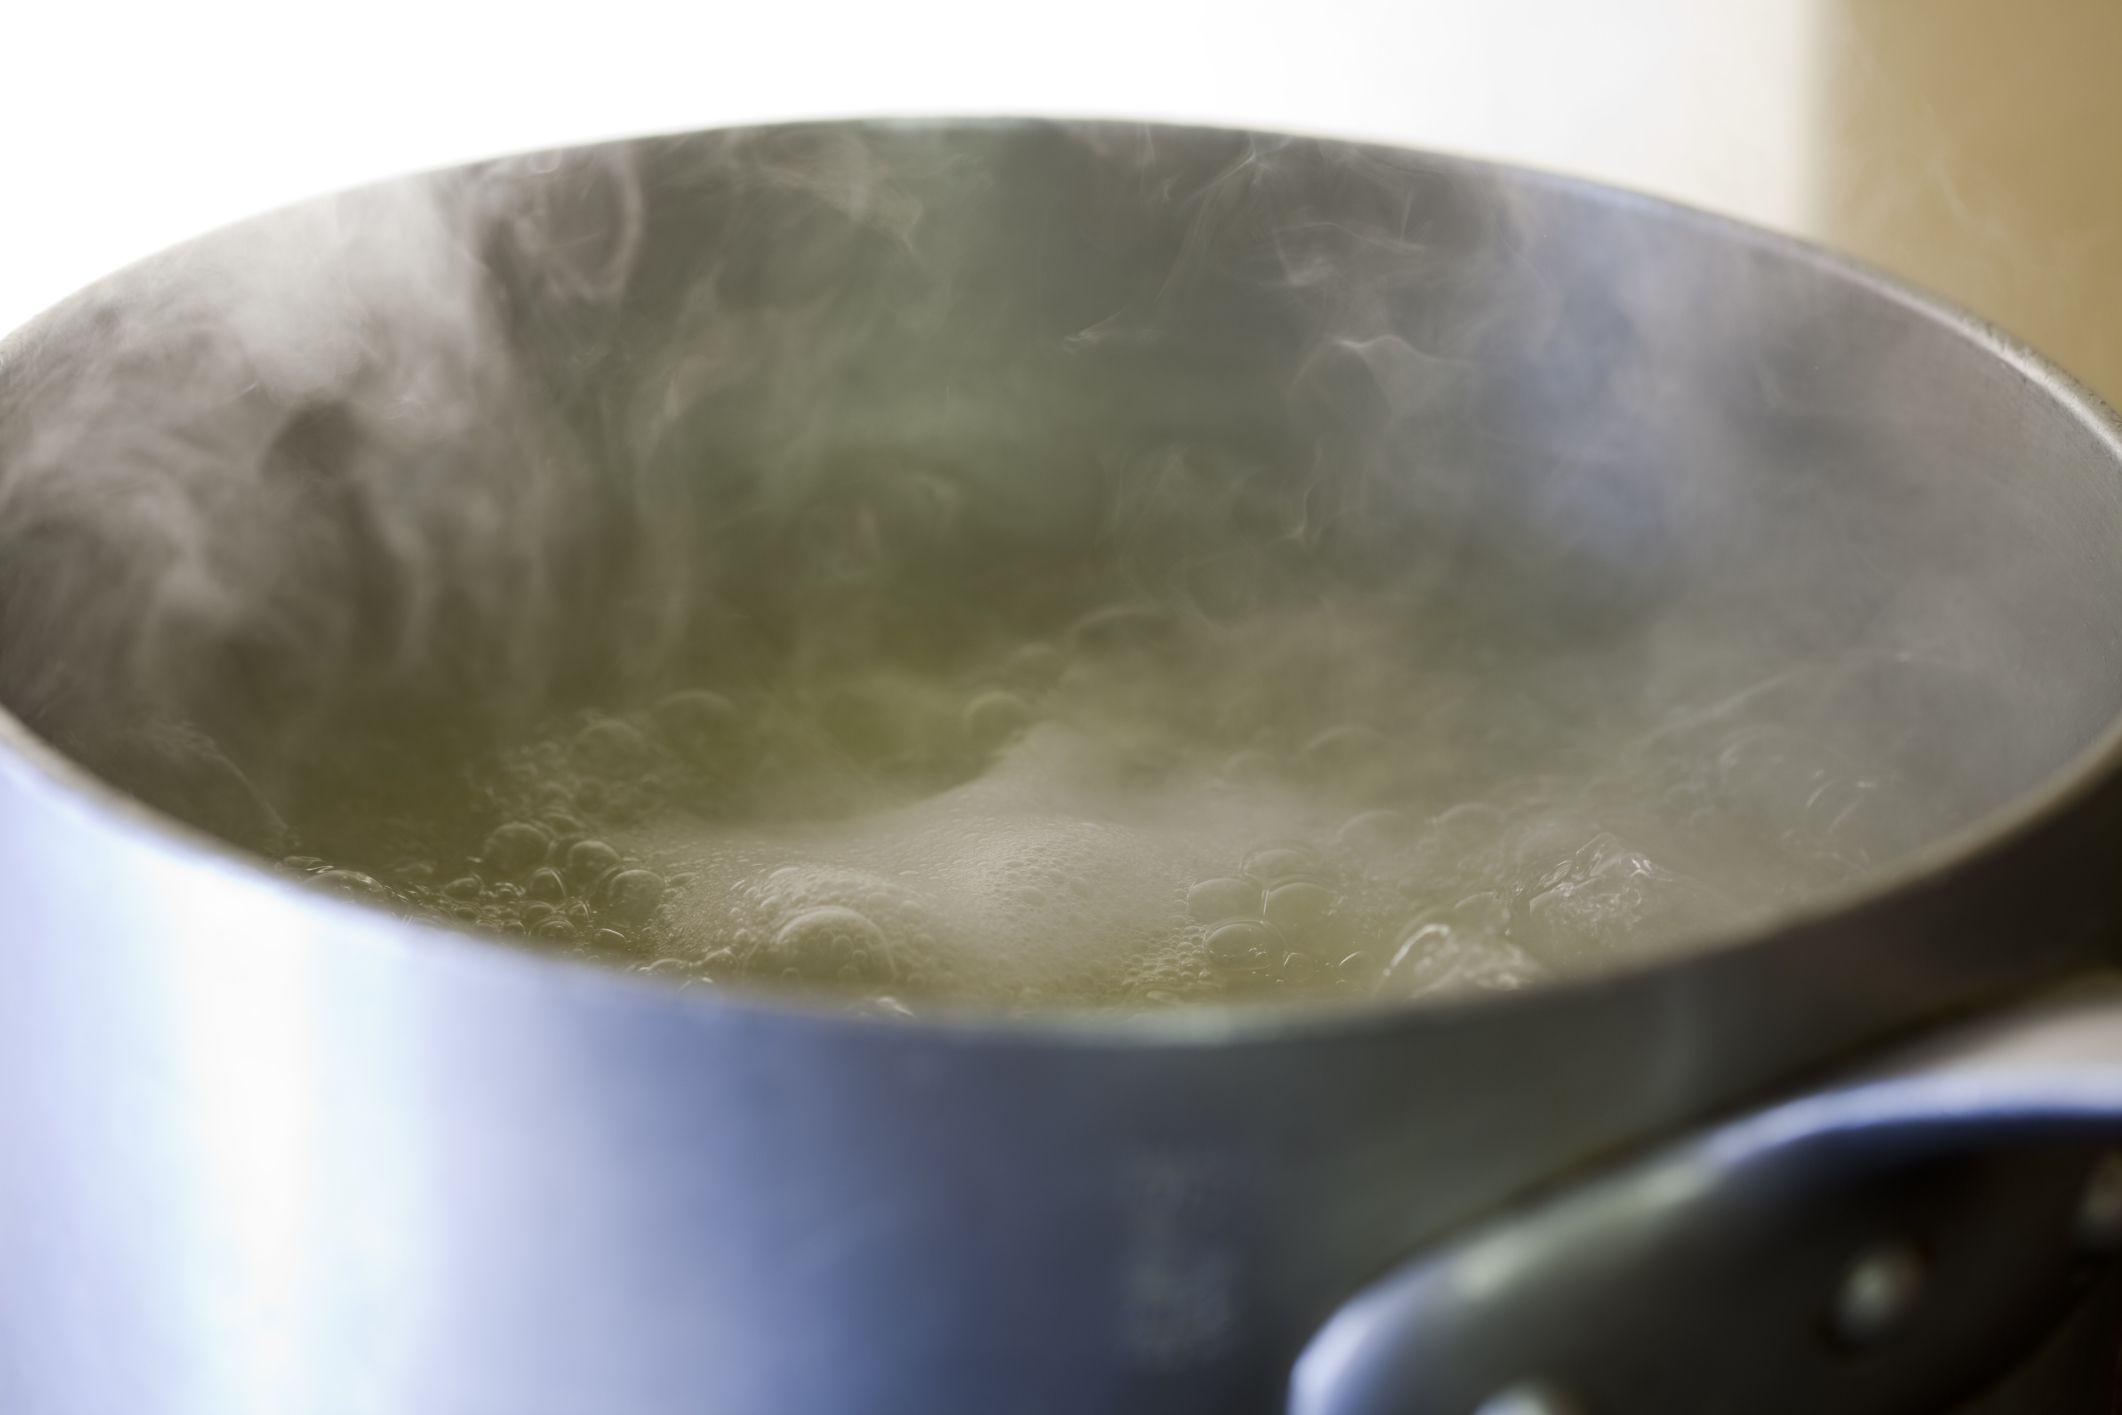 Simmering Broth in pot